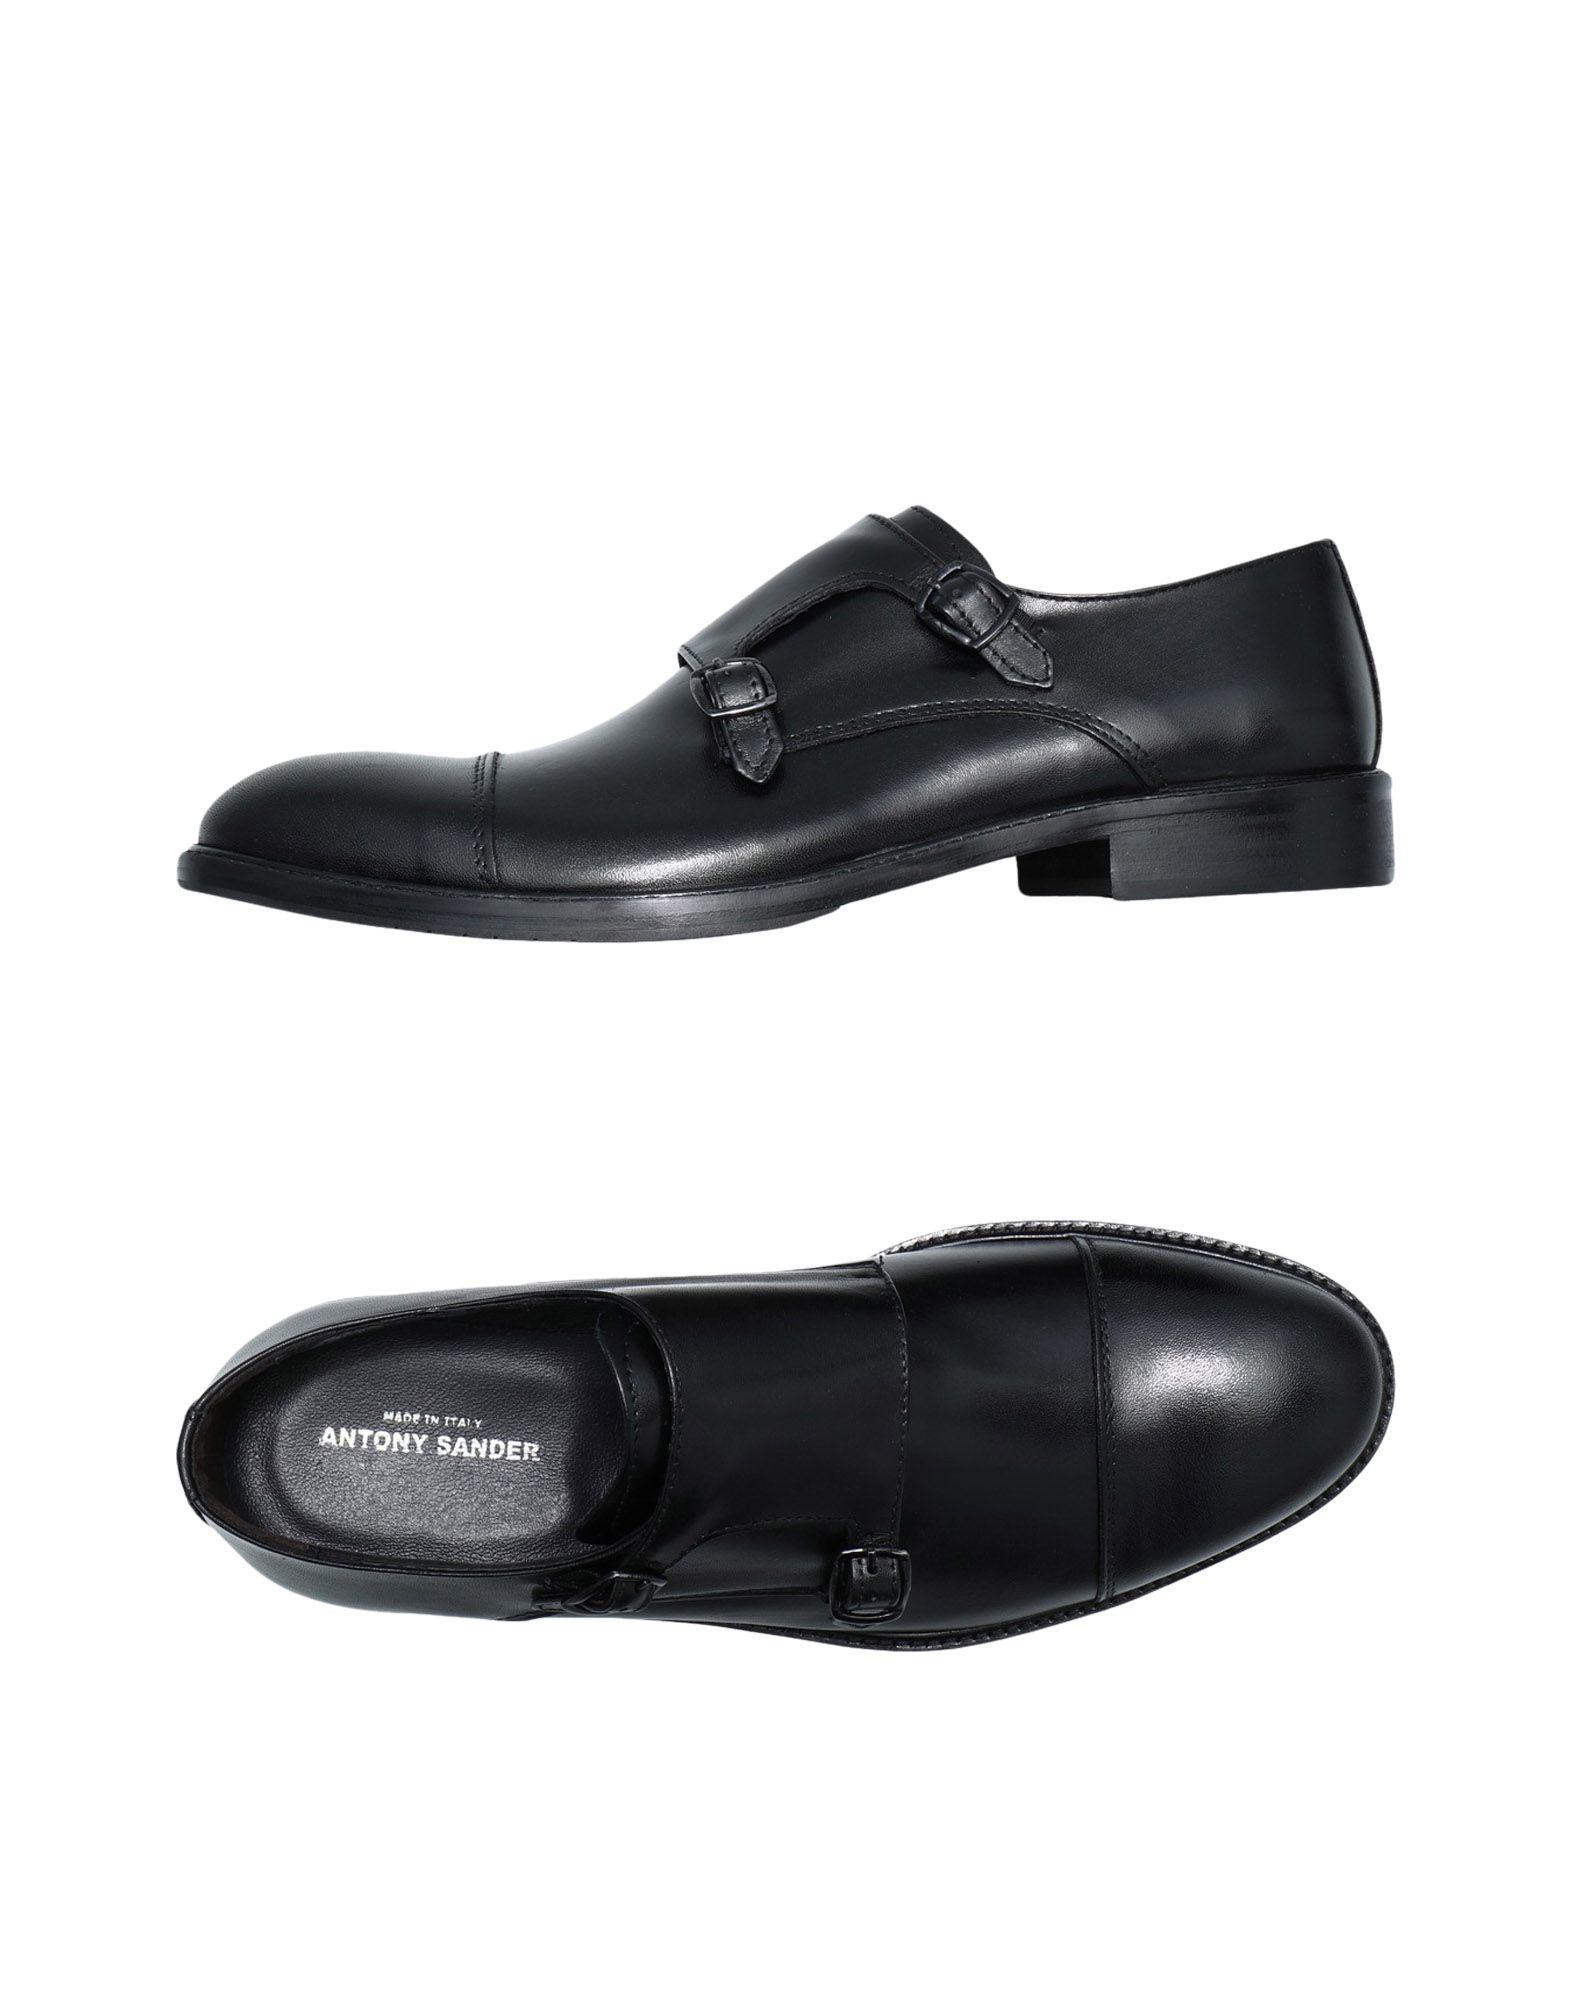 Rabatt echte Schuhe Antony Sander Mokassins Herren  11536877UM